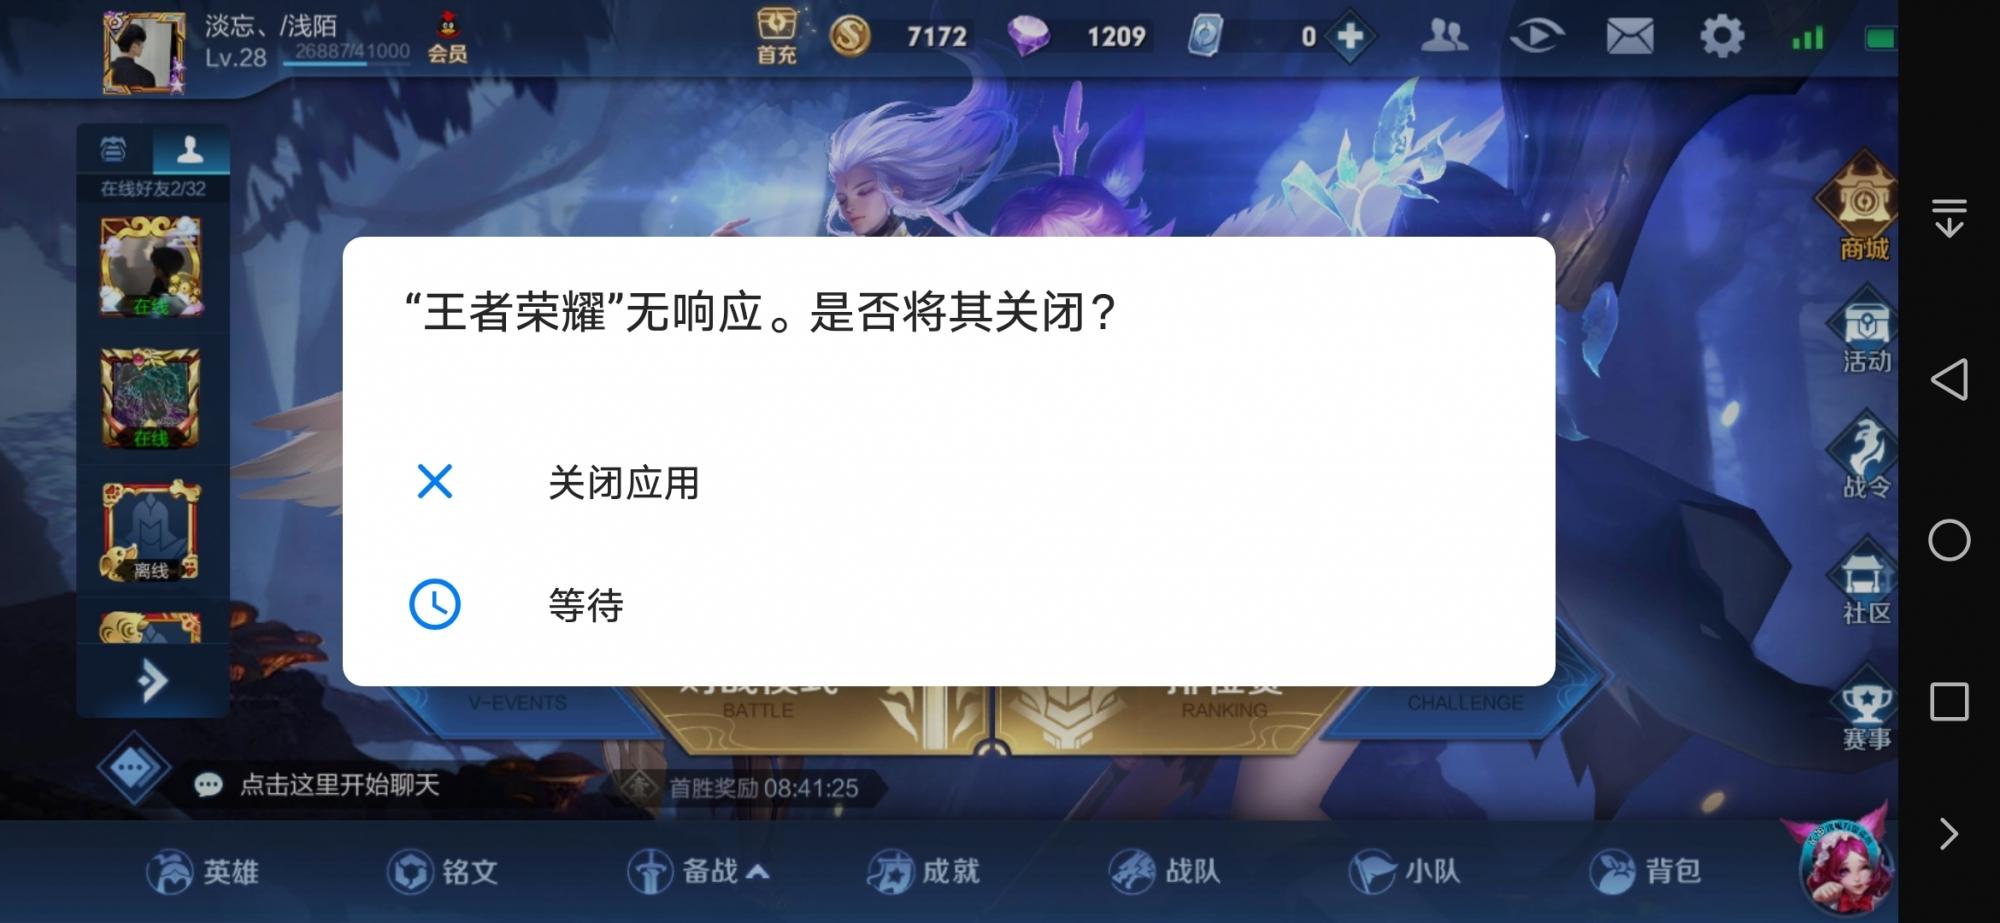 Screenshot_20190526_134242_com.tencent.tmgp.sgame.jpg